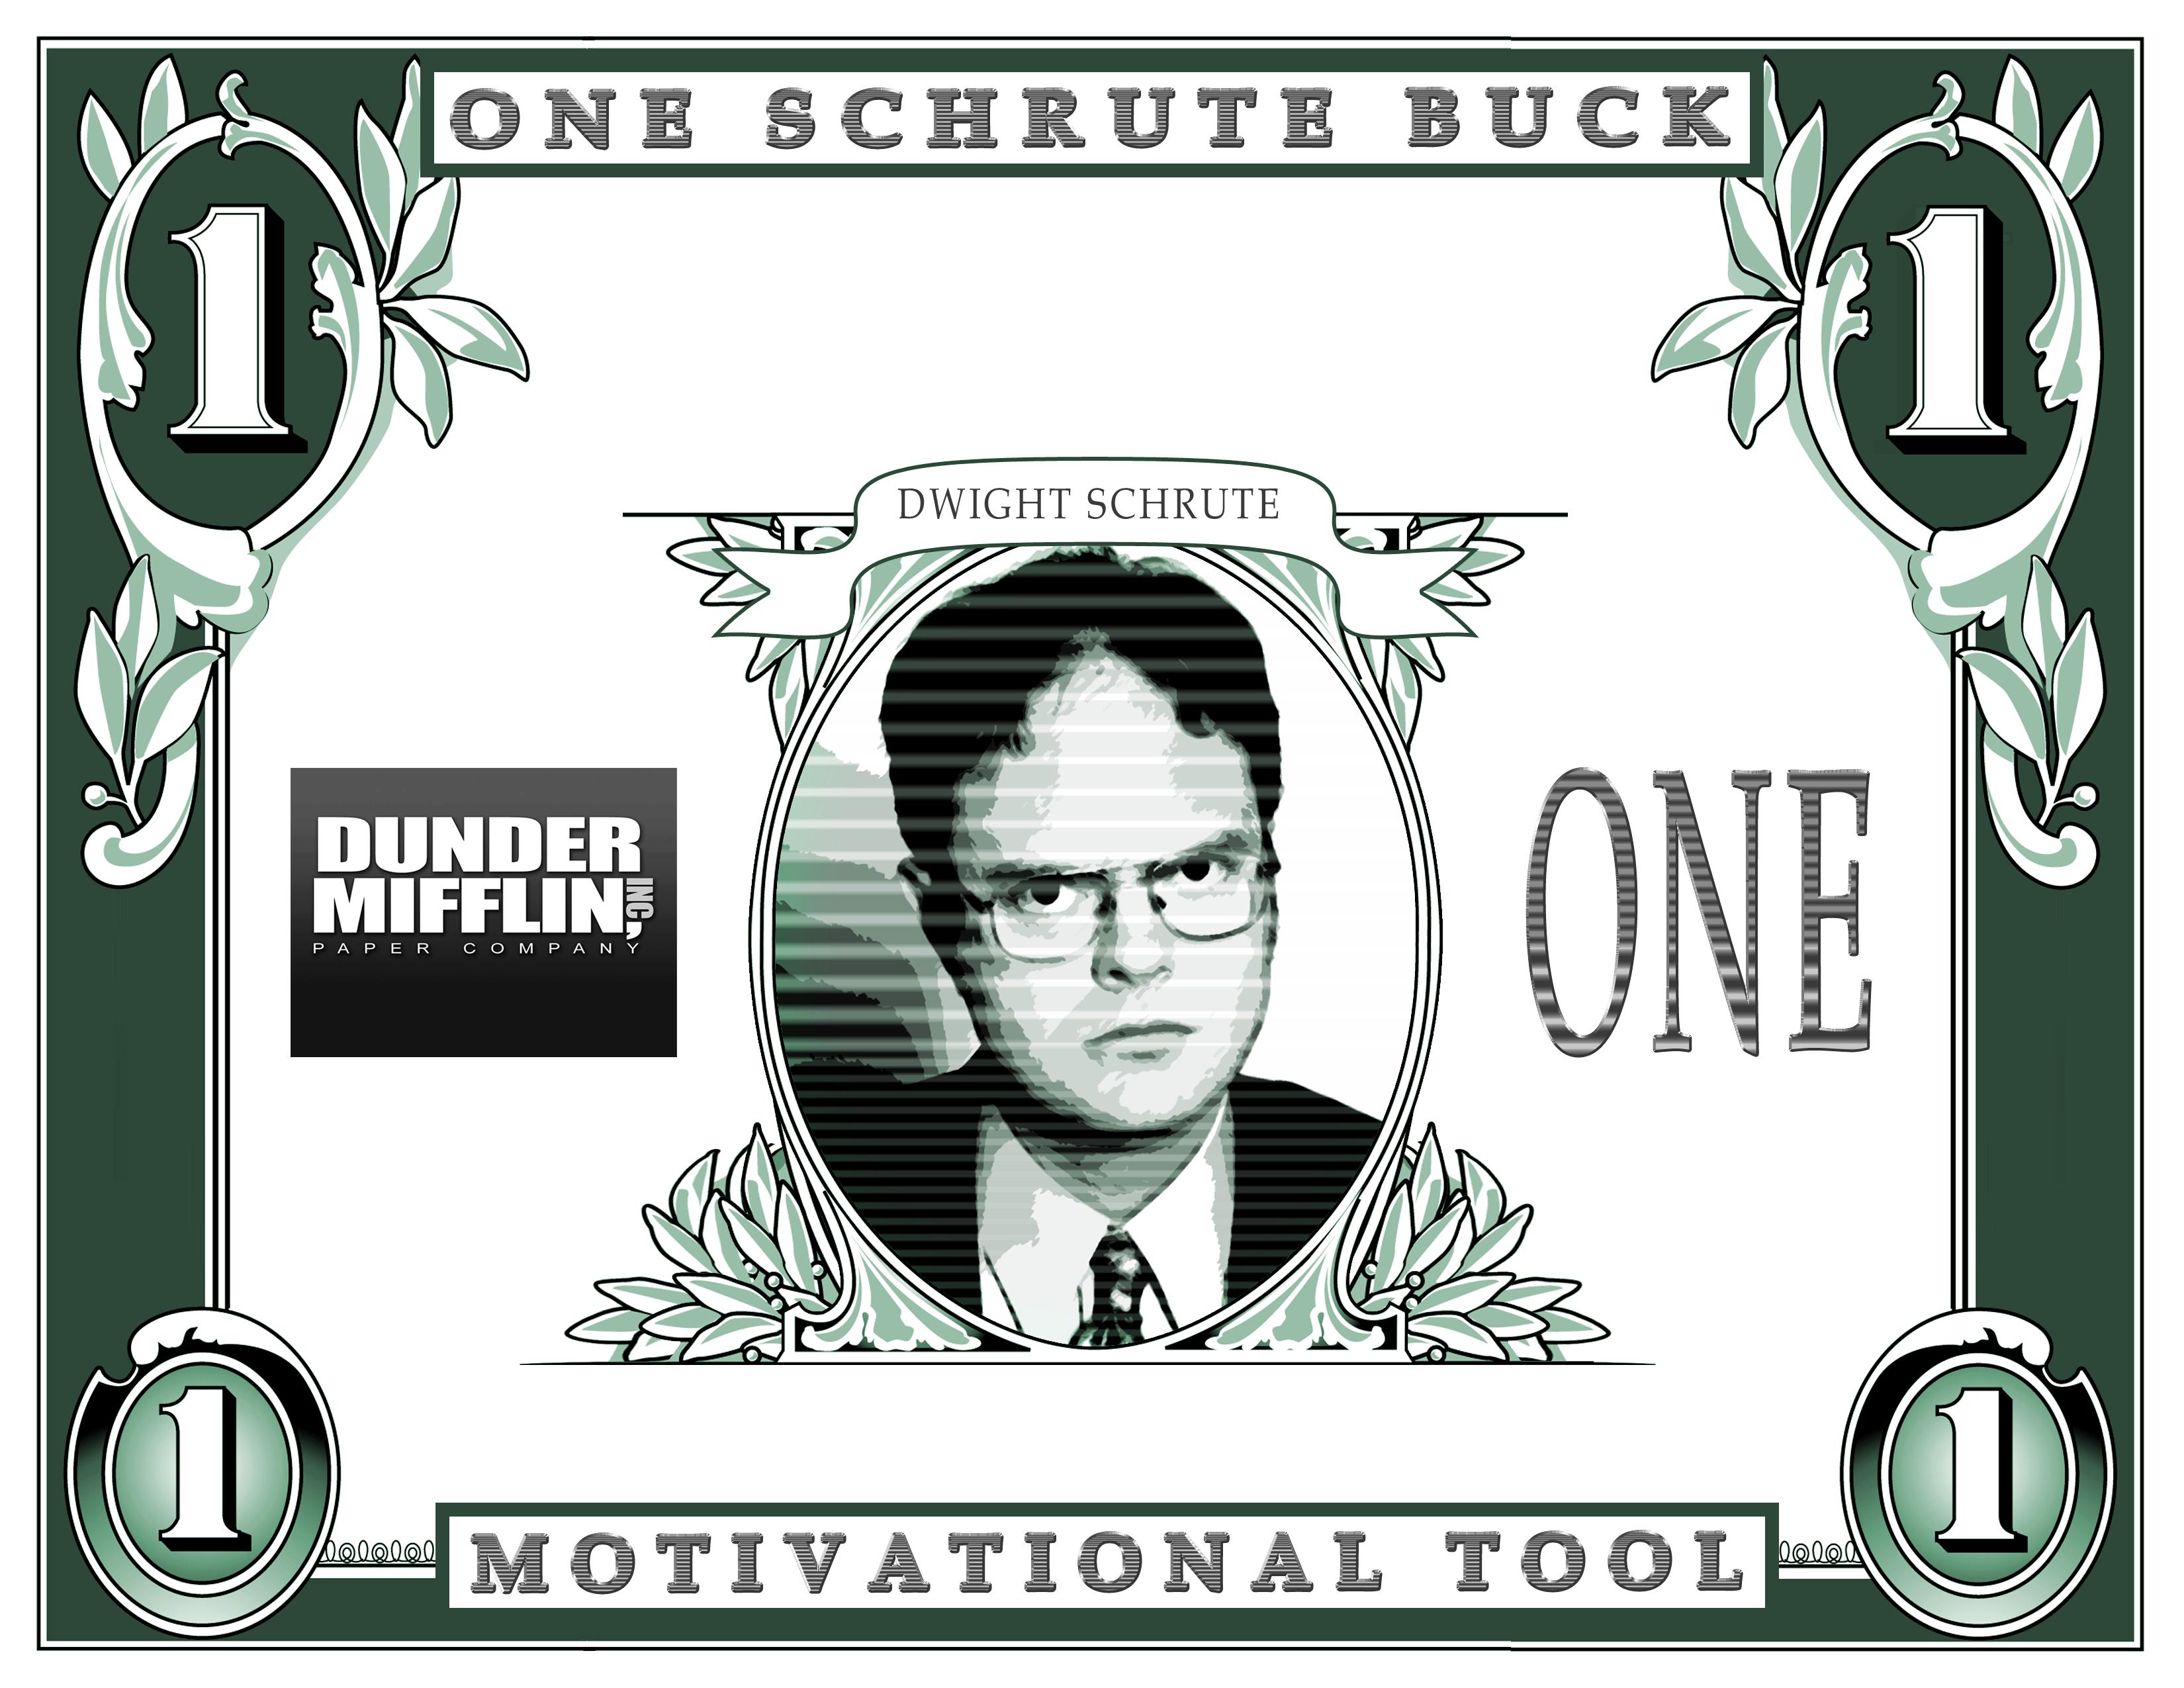 Printable Dwight Schrute Bucks Eden Escape